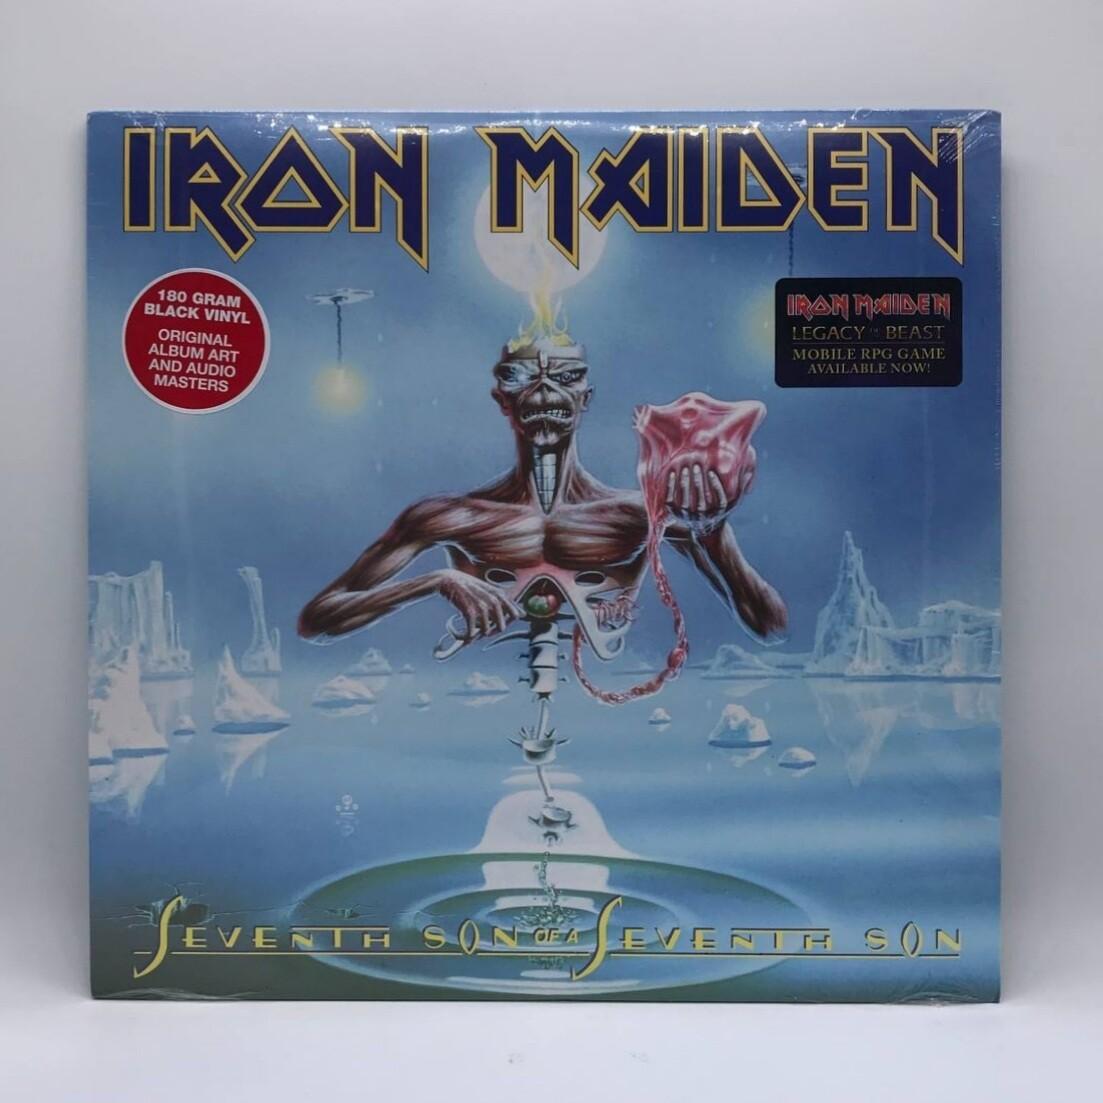 IRON MAIDEN -SEVENTH SON OF A SEVENTH SON- LP